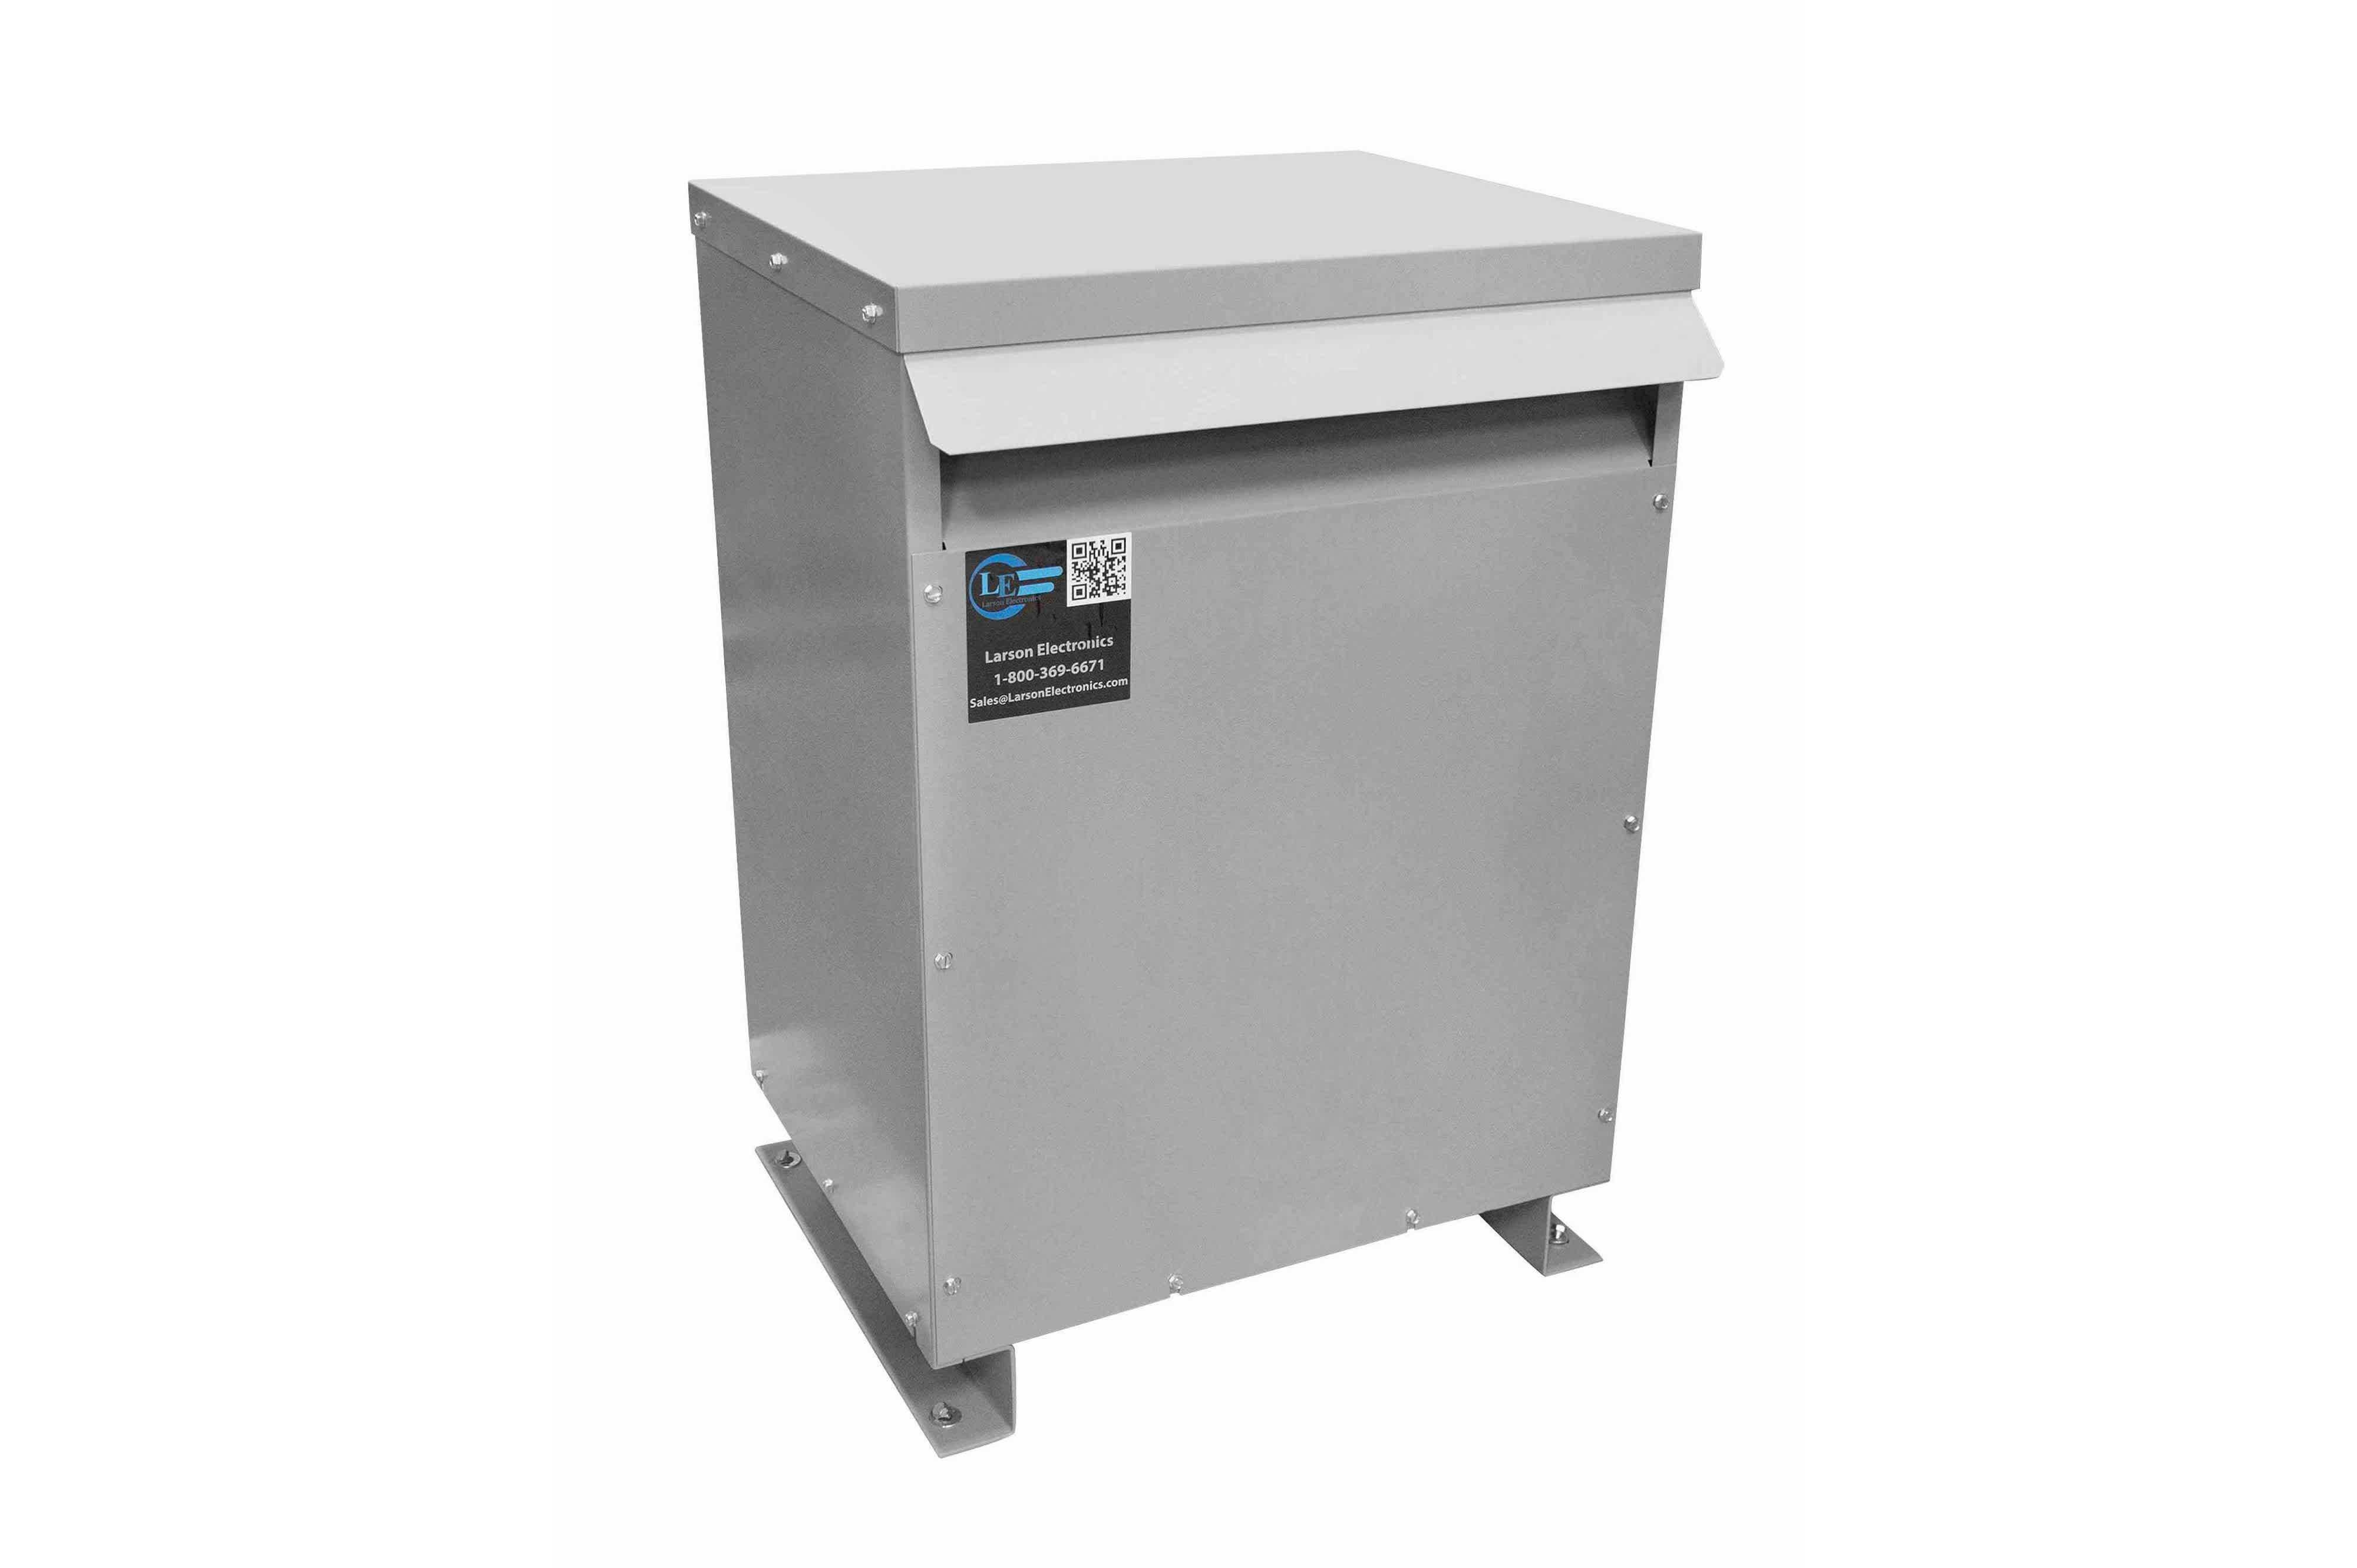 10 kVA 3PH Isolation Transformer, 208V Wye Primary, 600V Delta Secondary, N3R, Ventilated, 60 Hz